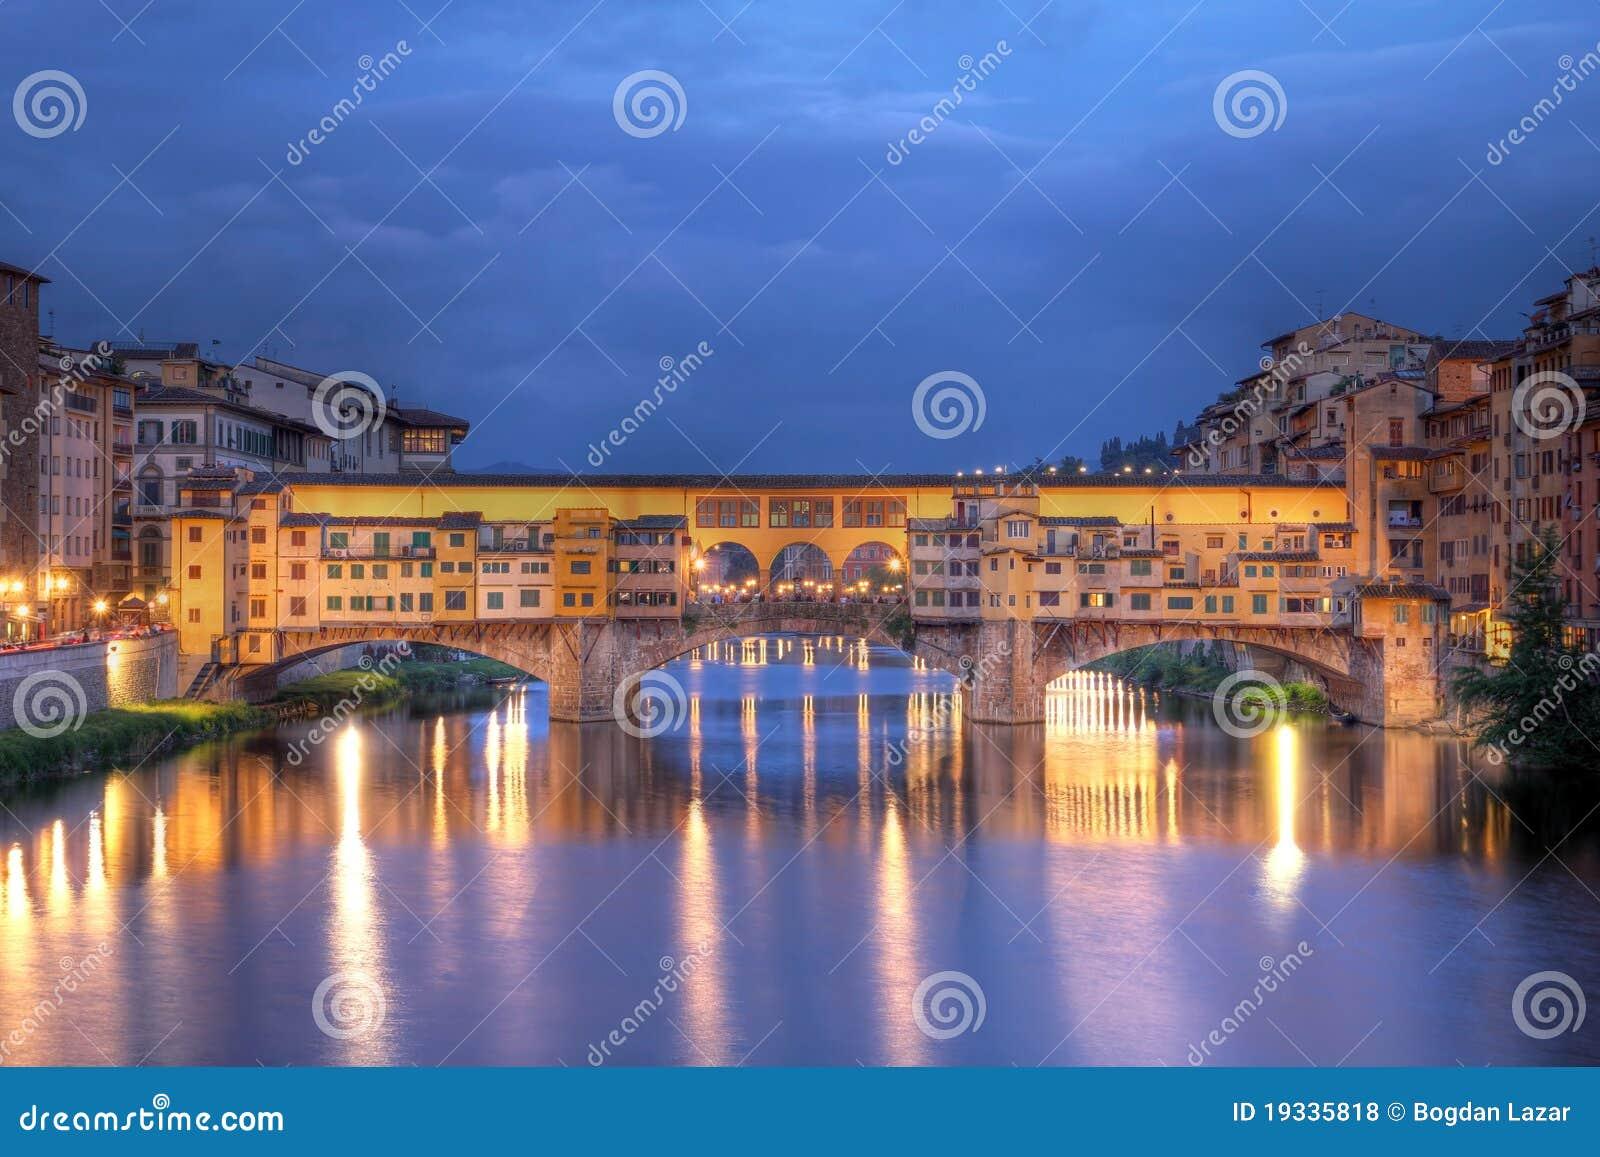 Passerelle à Florence, Italie